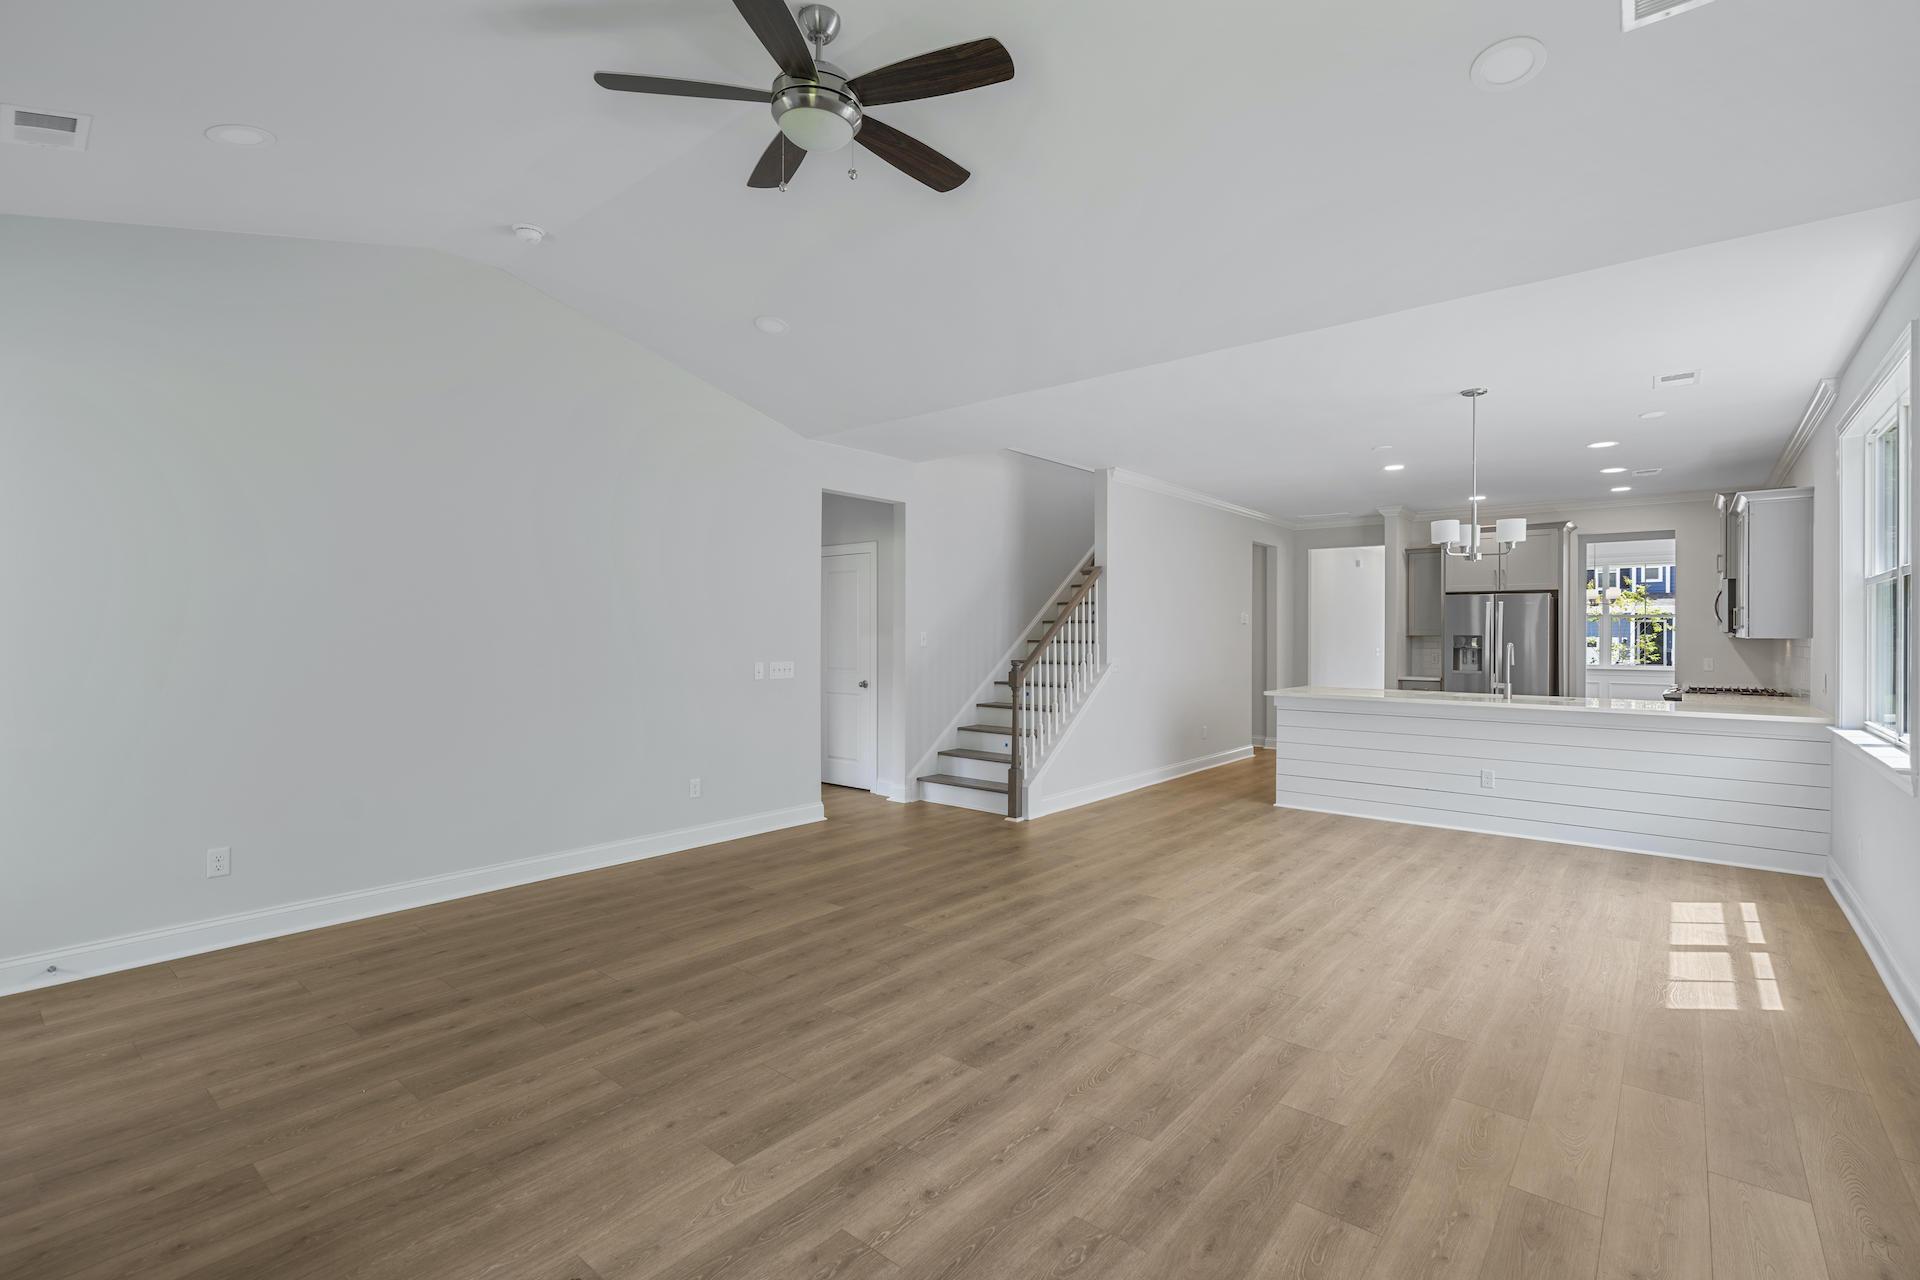 Drayton Oaks Homes For Sale - 105 Plowden Mill, Summerville, SC - 19